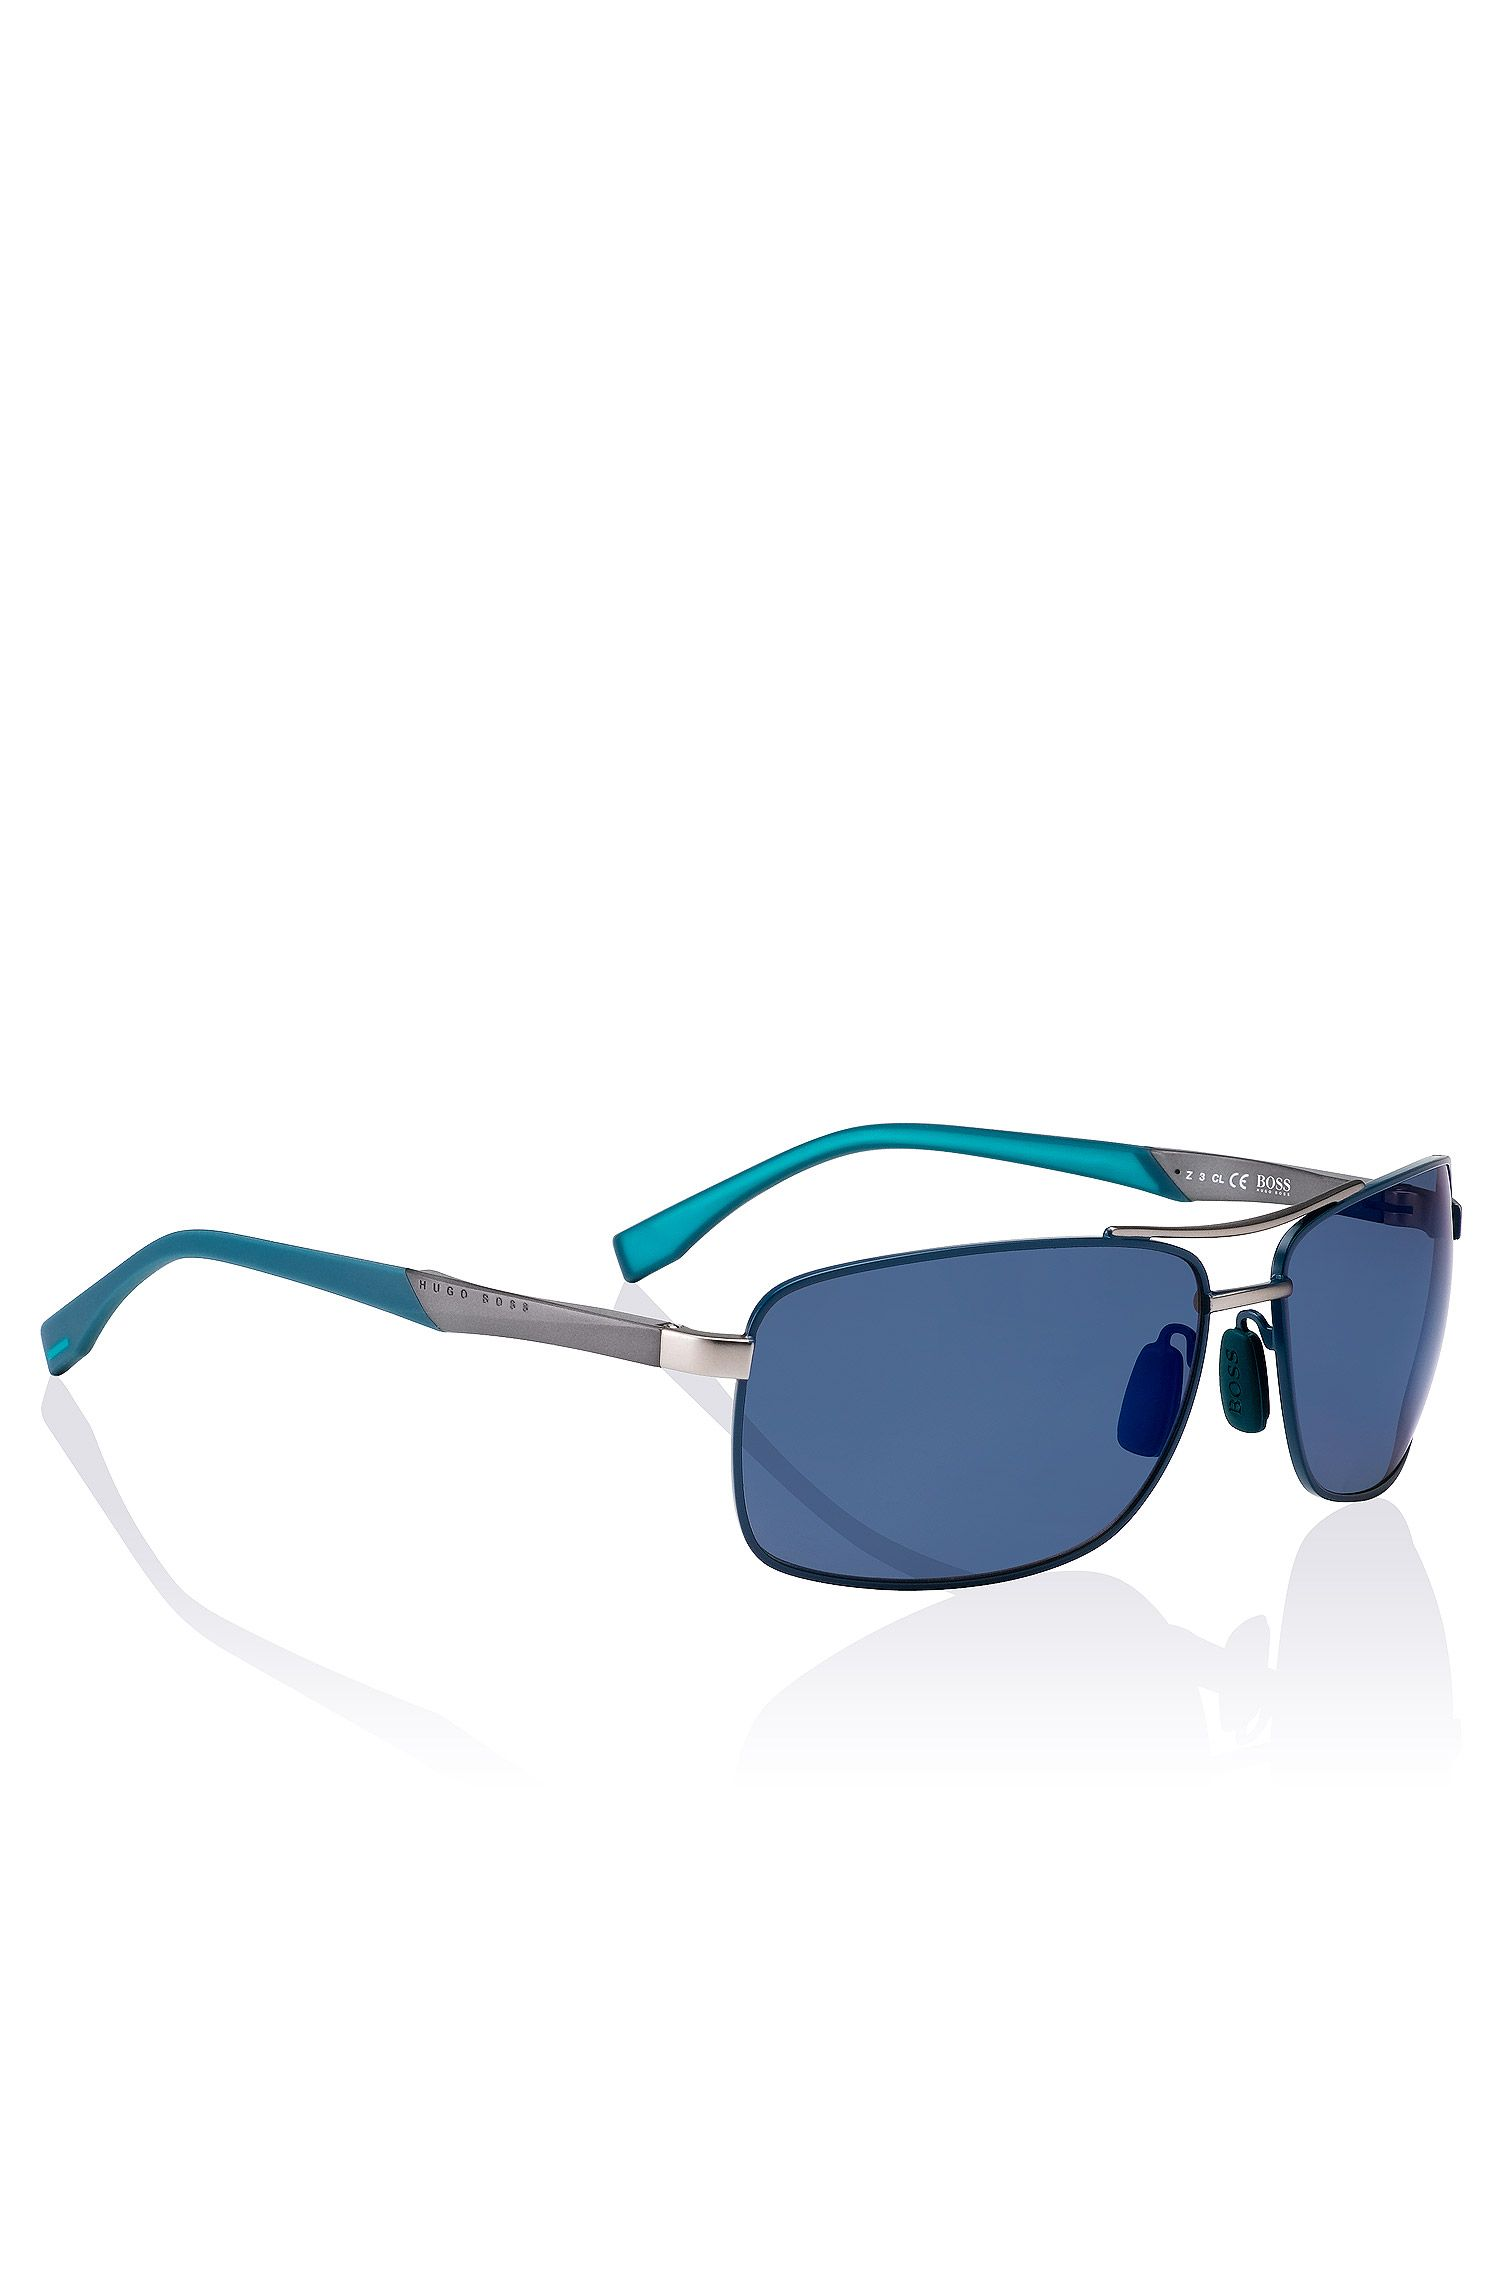 Navigator sunglasses 'BOSS 0697/P/S'